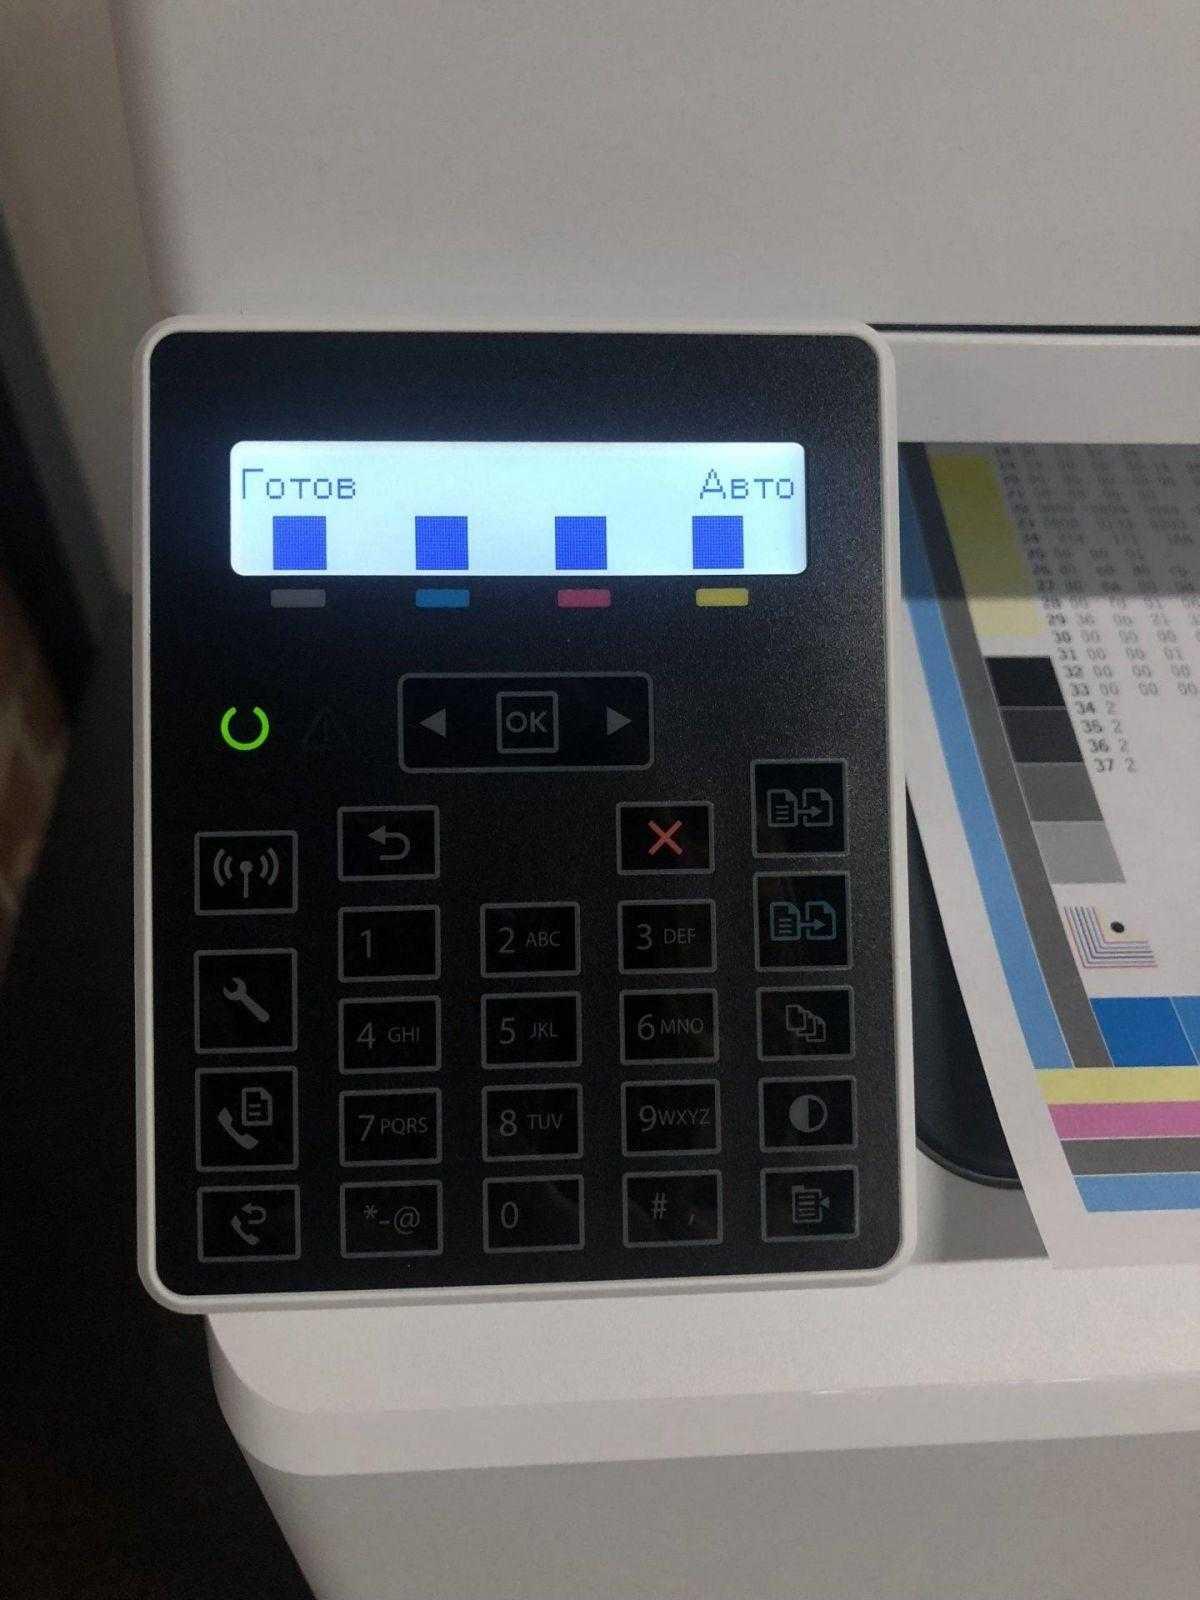 Идеален для офиса. Обзор МФУ HP Color LaserJet Pro M181fw (img 8742 1)